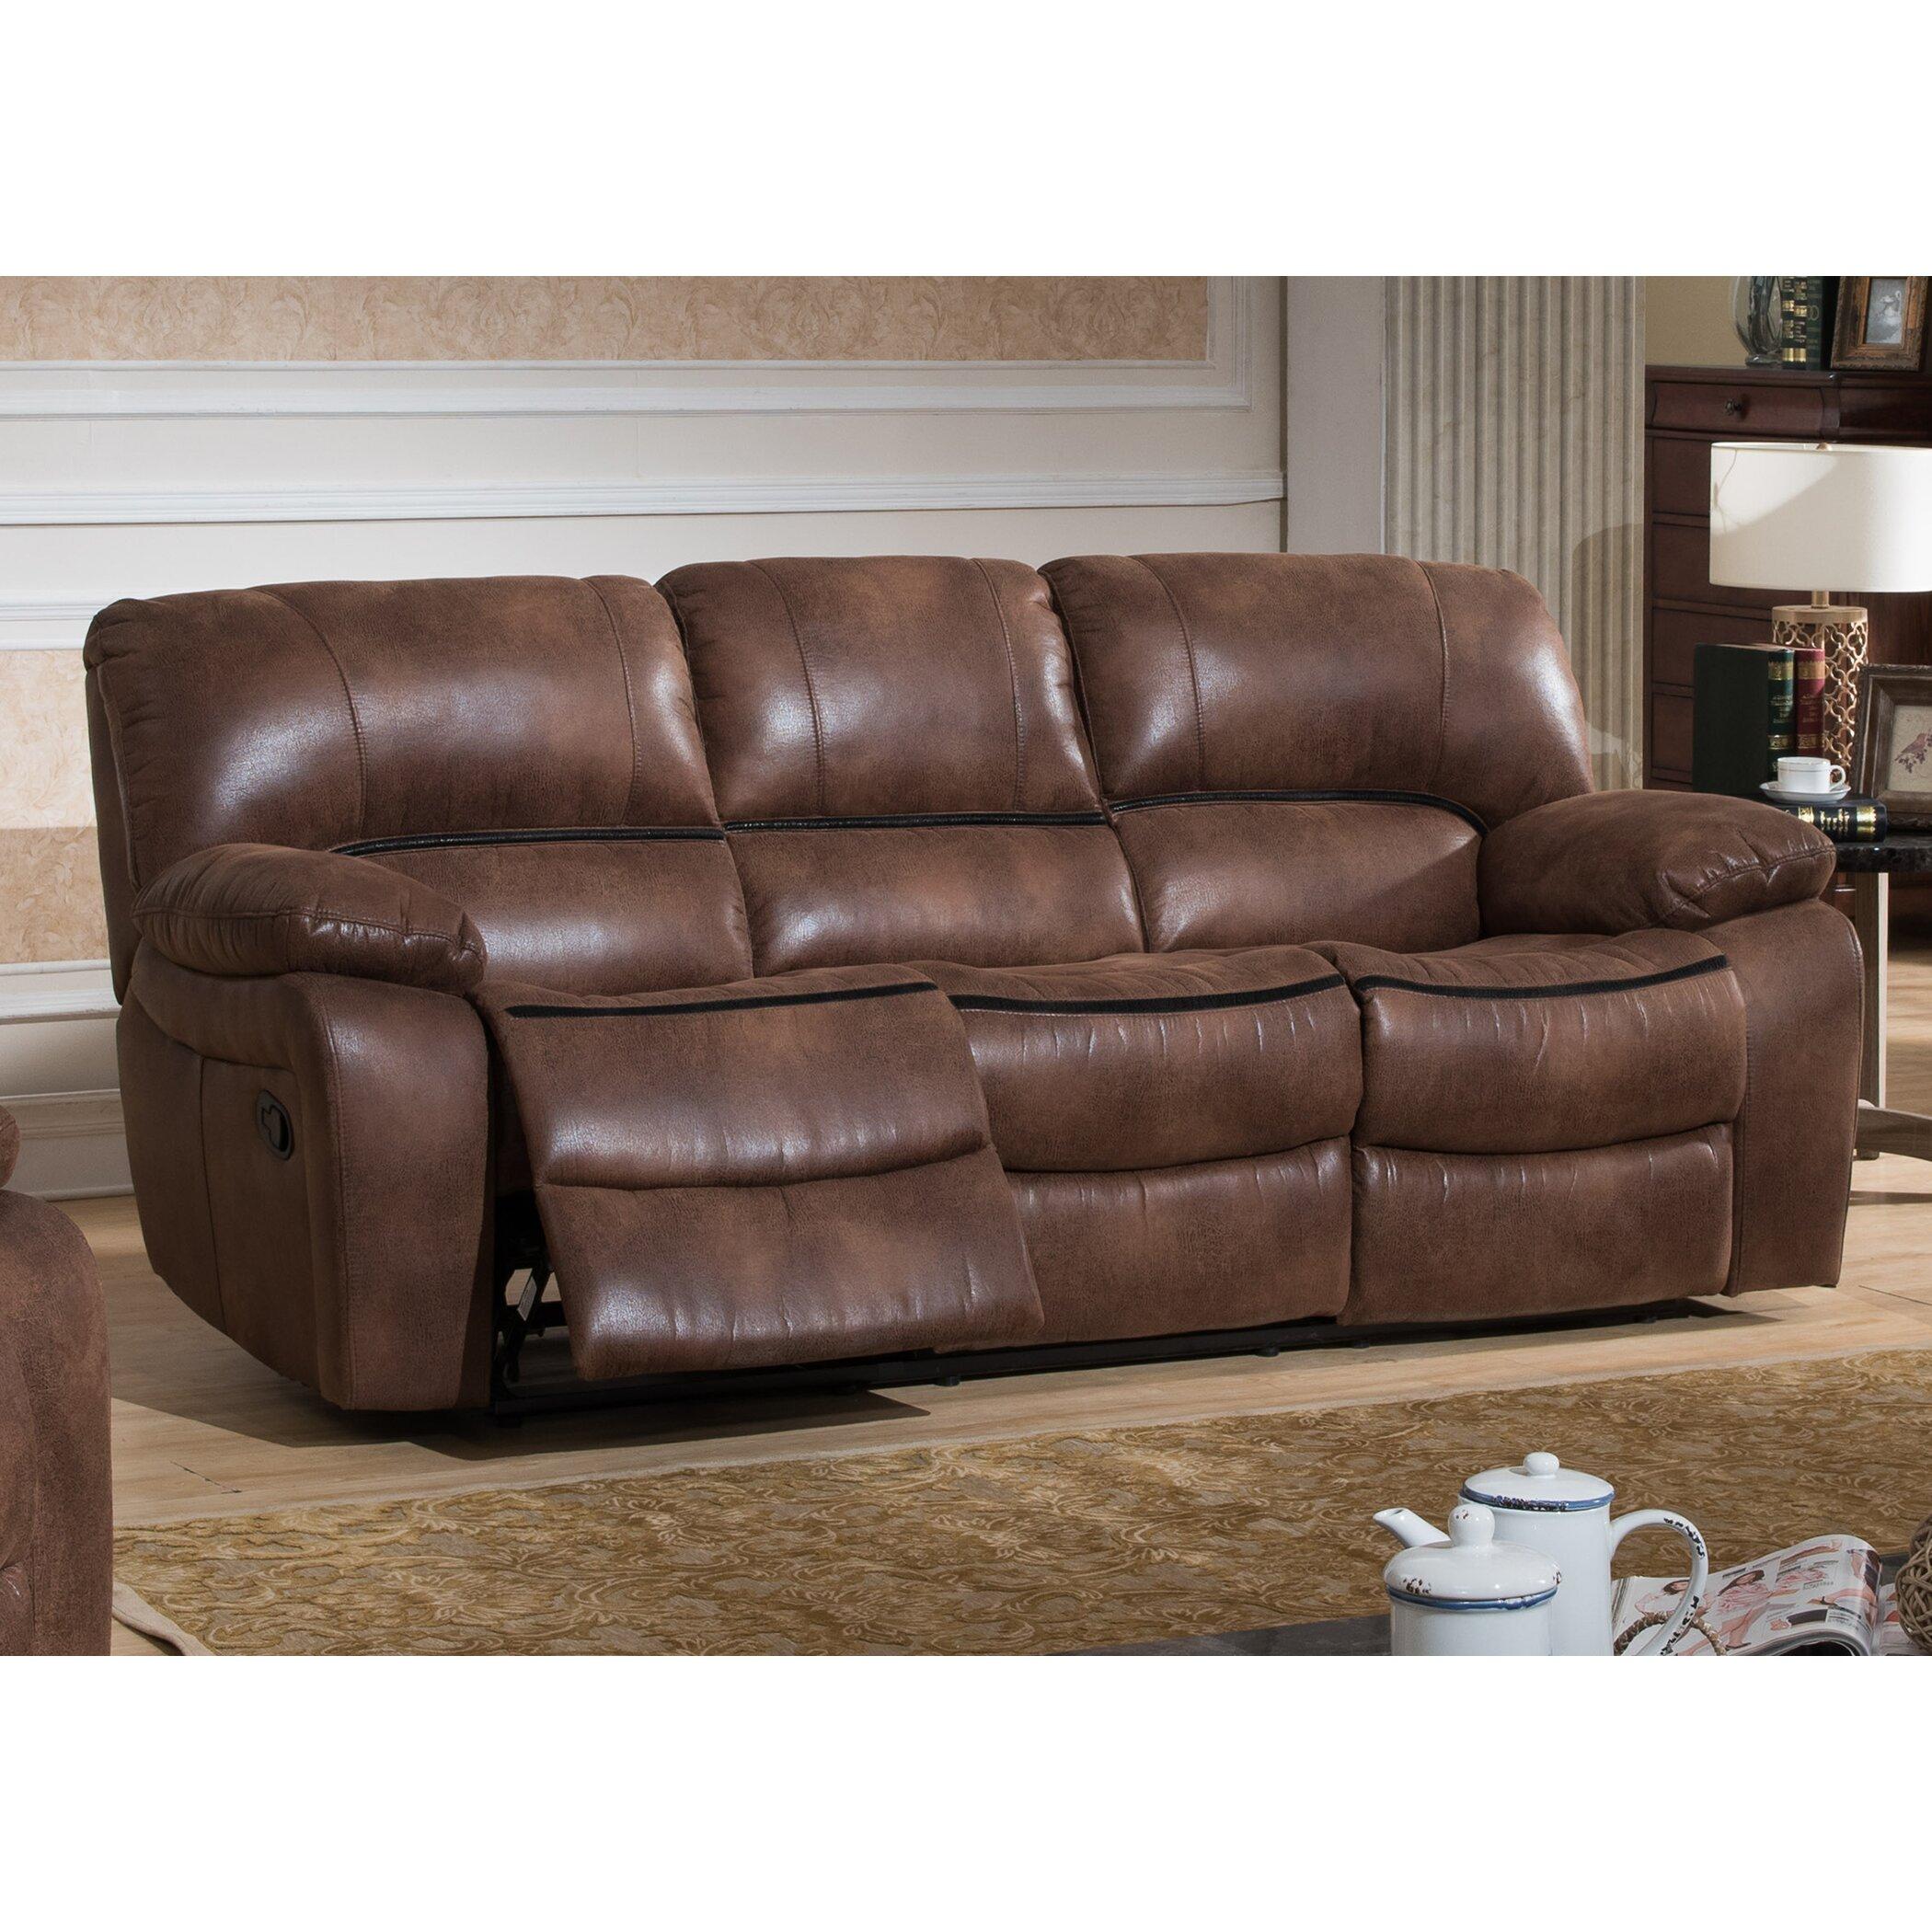 ac pacific leighton 3 piece reclining living room set